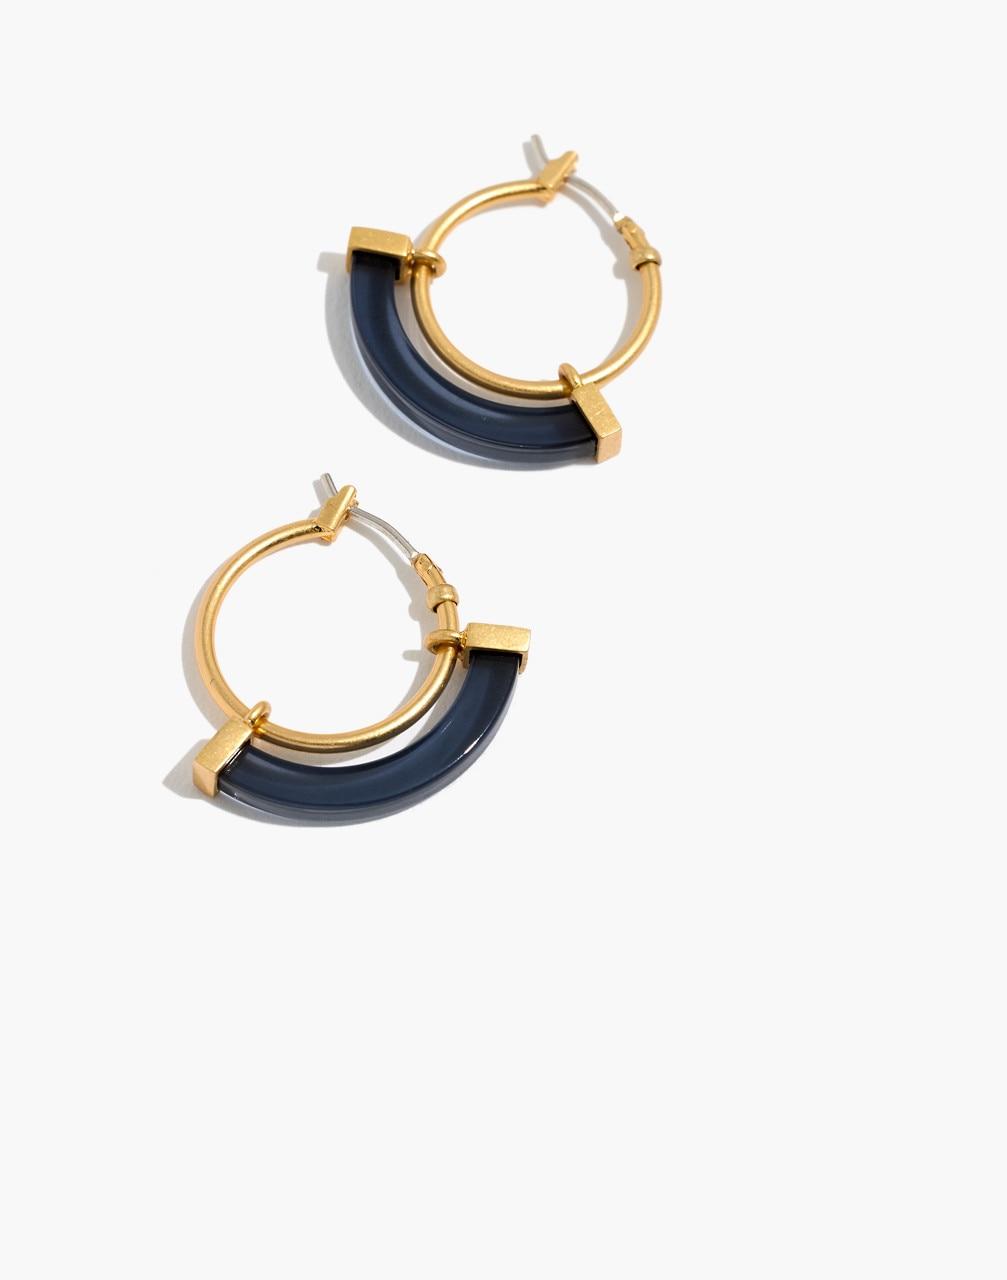 Resin Sliding Hoop Earrings - Madewell